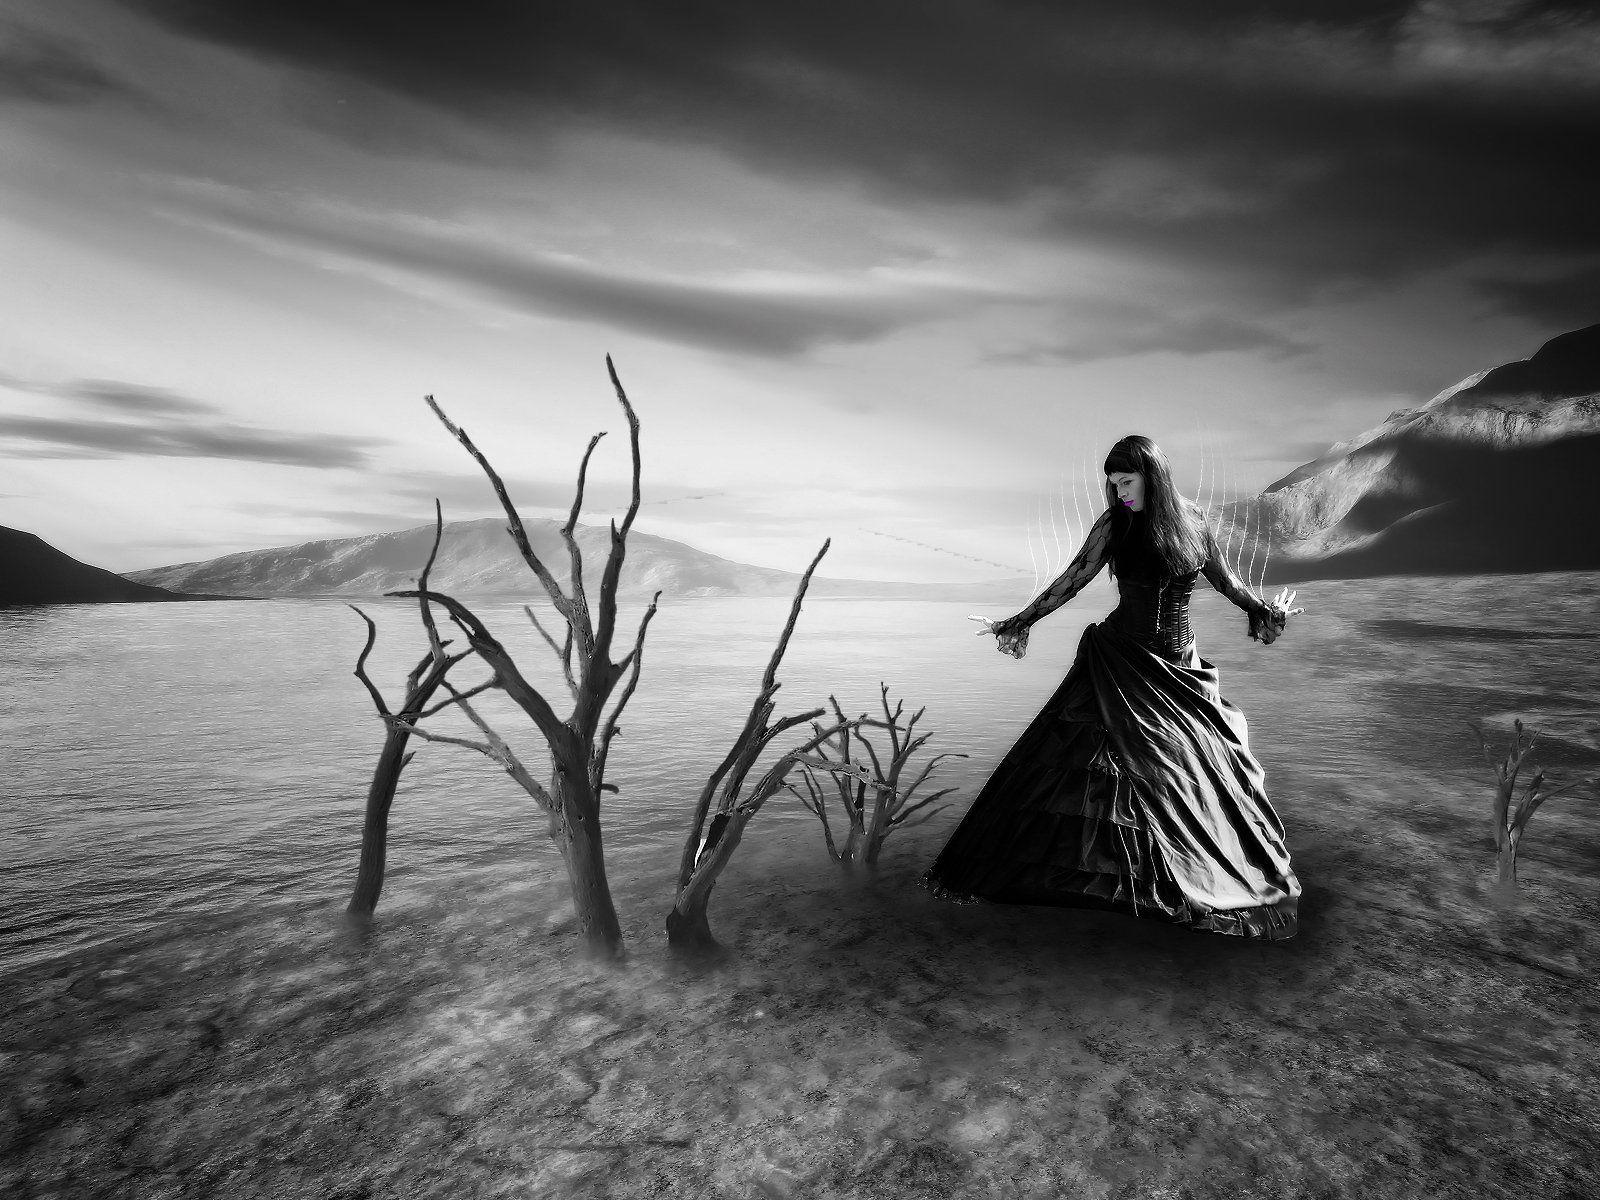 Hd Beautiful Gothic 4k Image